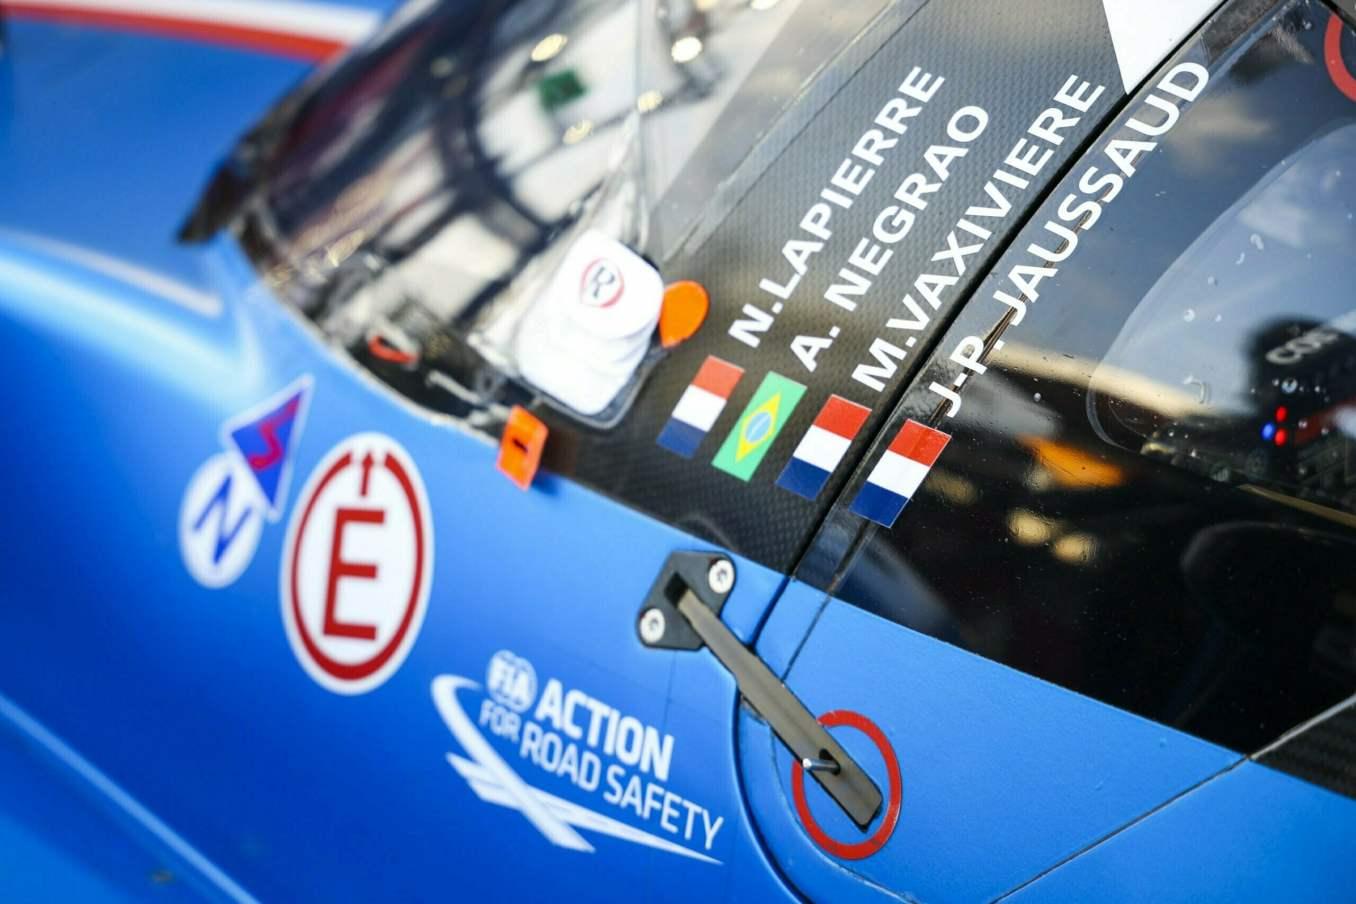 Alpine Endurance Team A480 24 Heures du Mans 2021 5 scaled | Les 24h du mans d'Alpine Endurance Team en photos